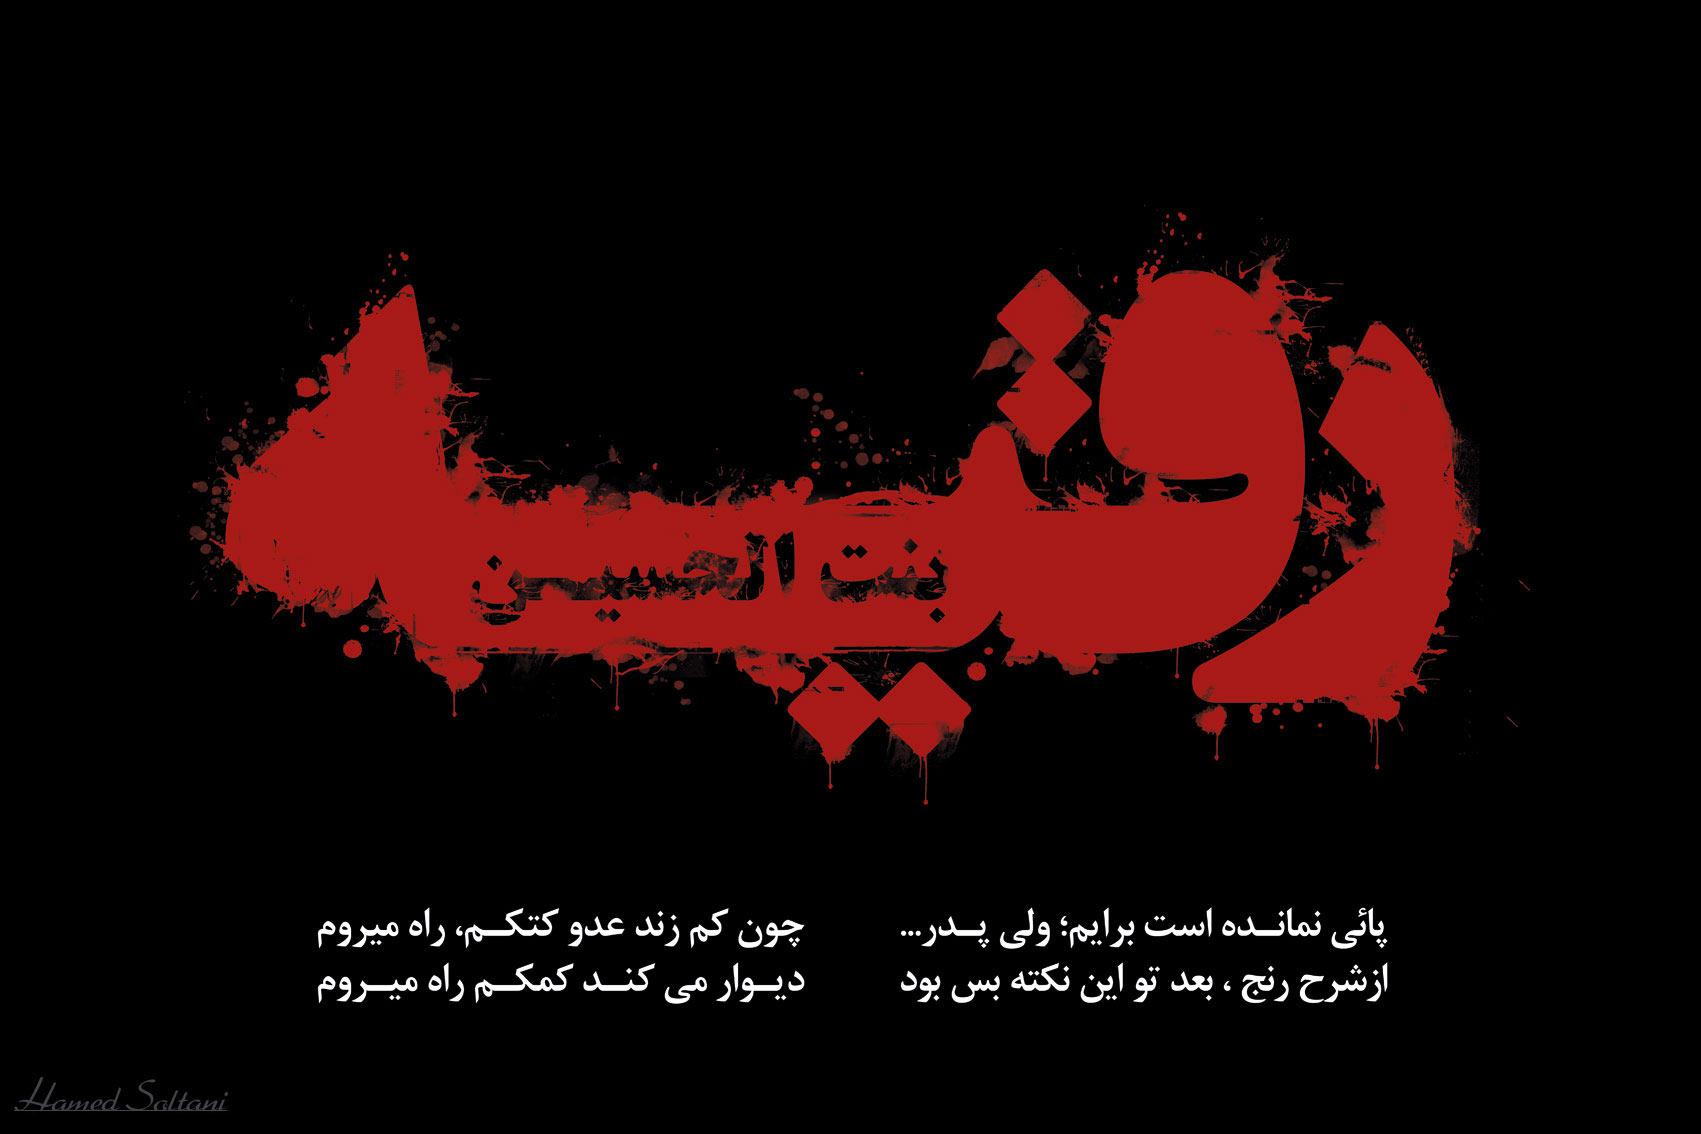 http://www.sibtayn.com/swf/gallery/images/monasebat/moharam/h_roghaye/pic3/h_roghaye_01.jpg